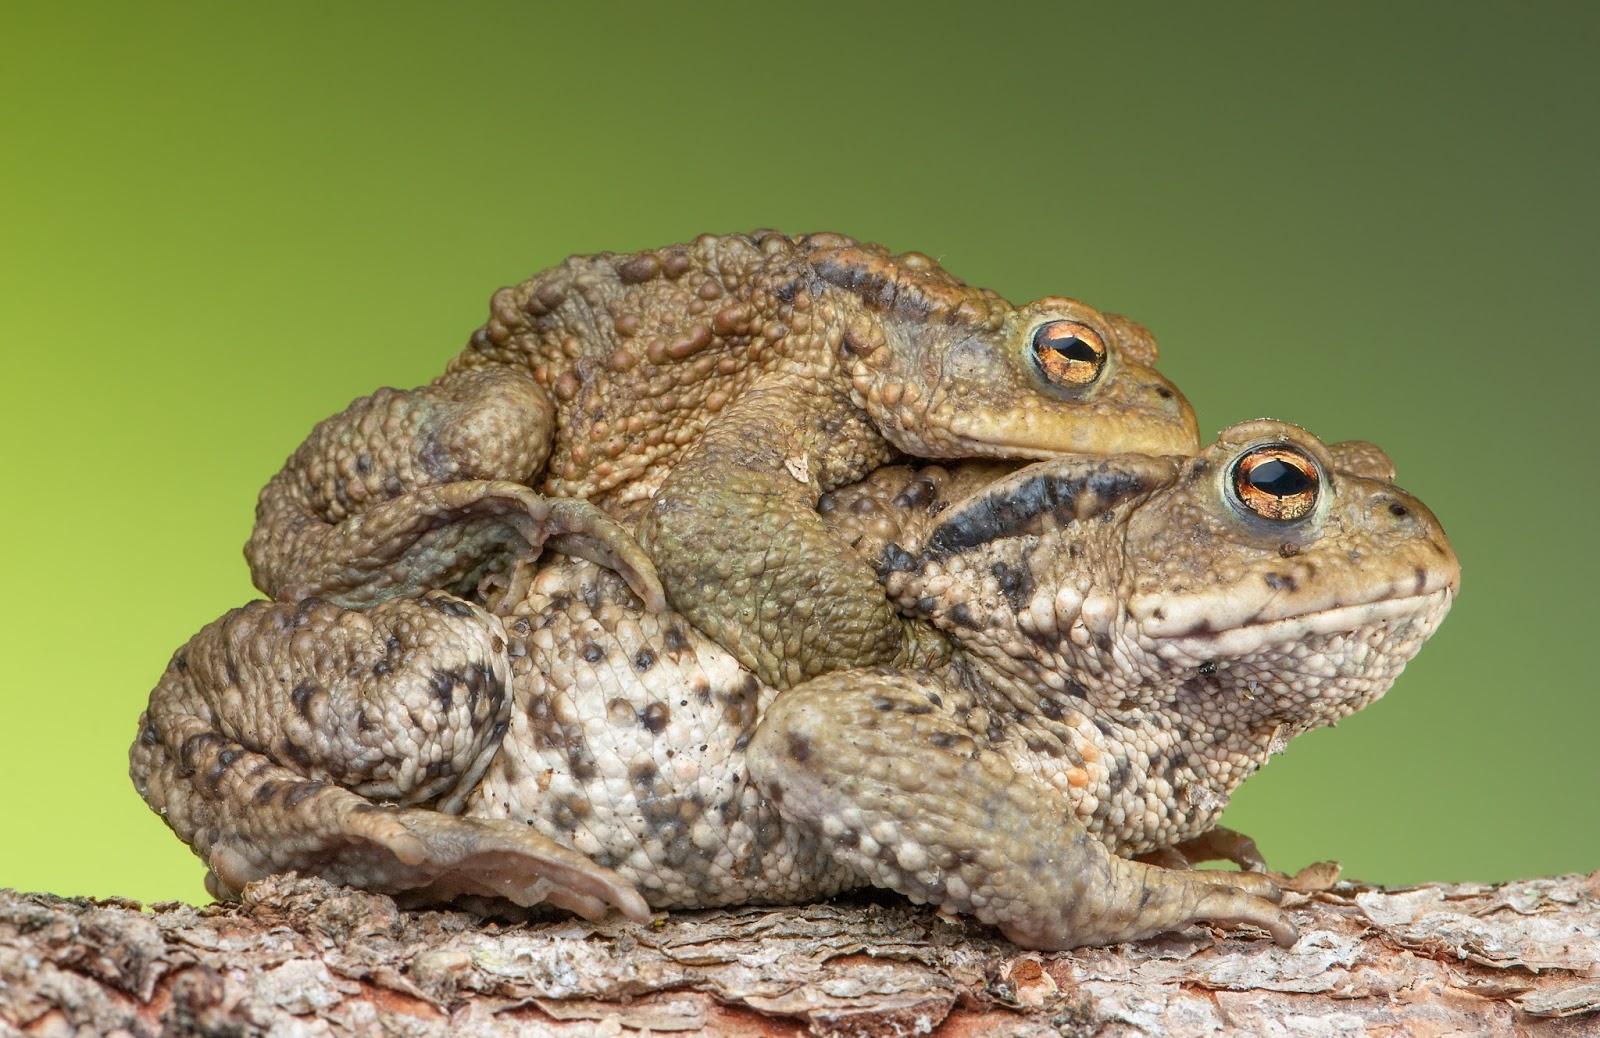 Amphibians: Amplexus Bufo bufo